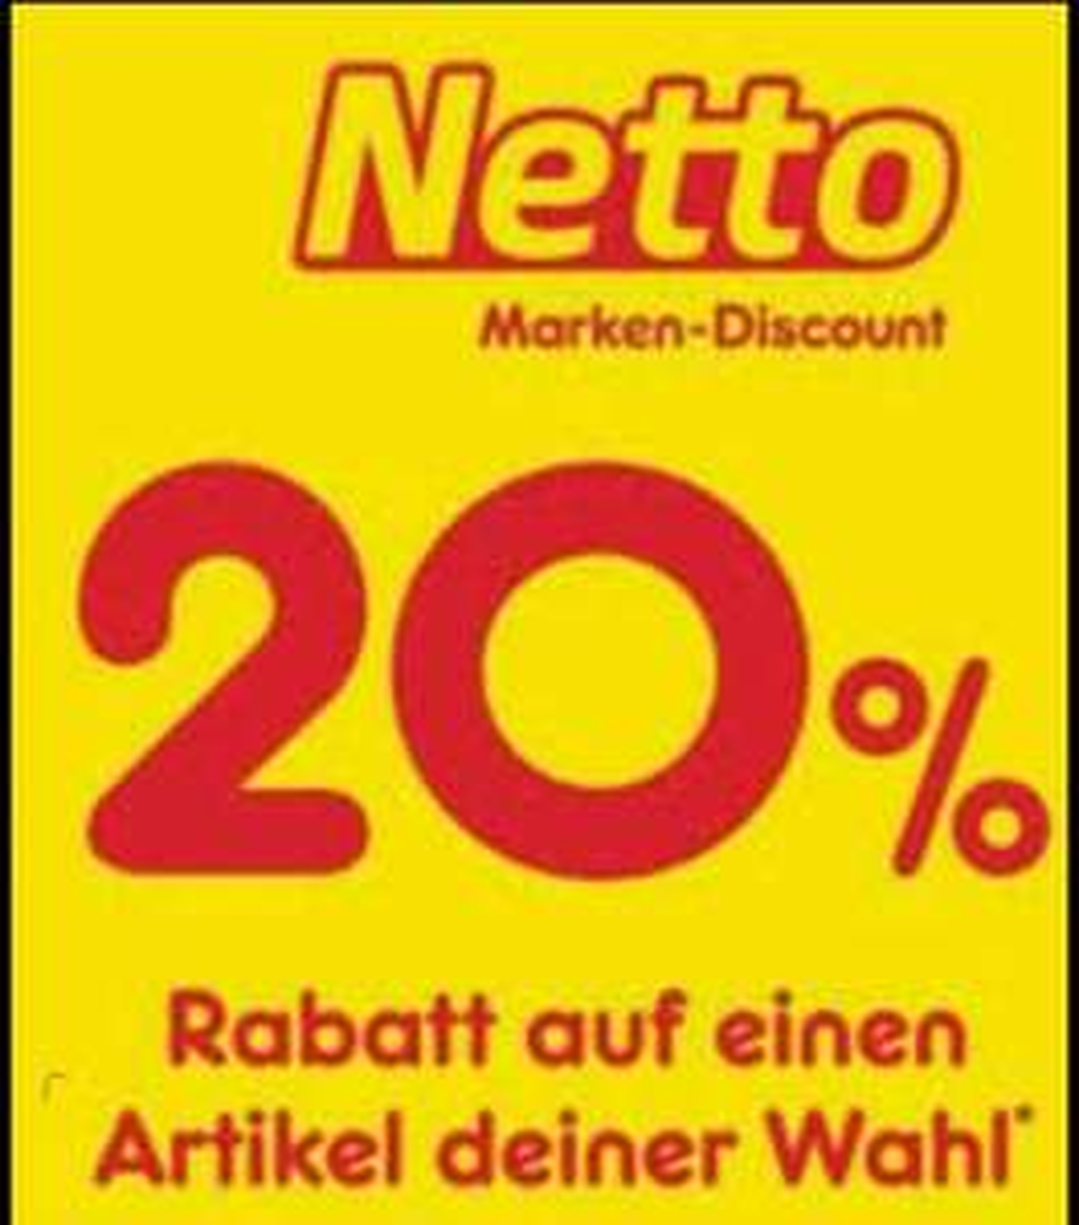 [Netto MD] Rabatt Coupons KW17 (26.04. - 30.04.), bundesweit einsetzbar